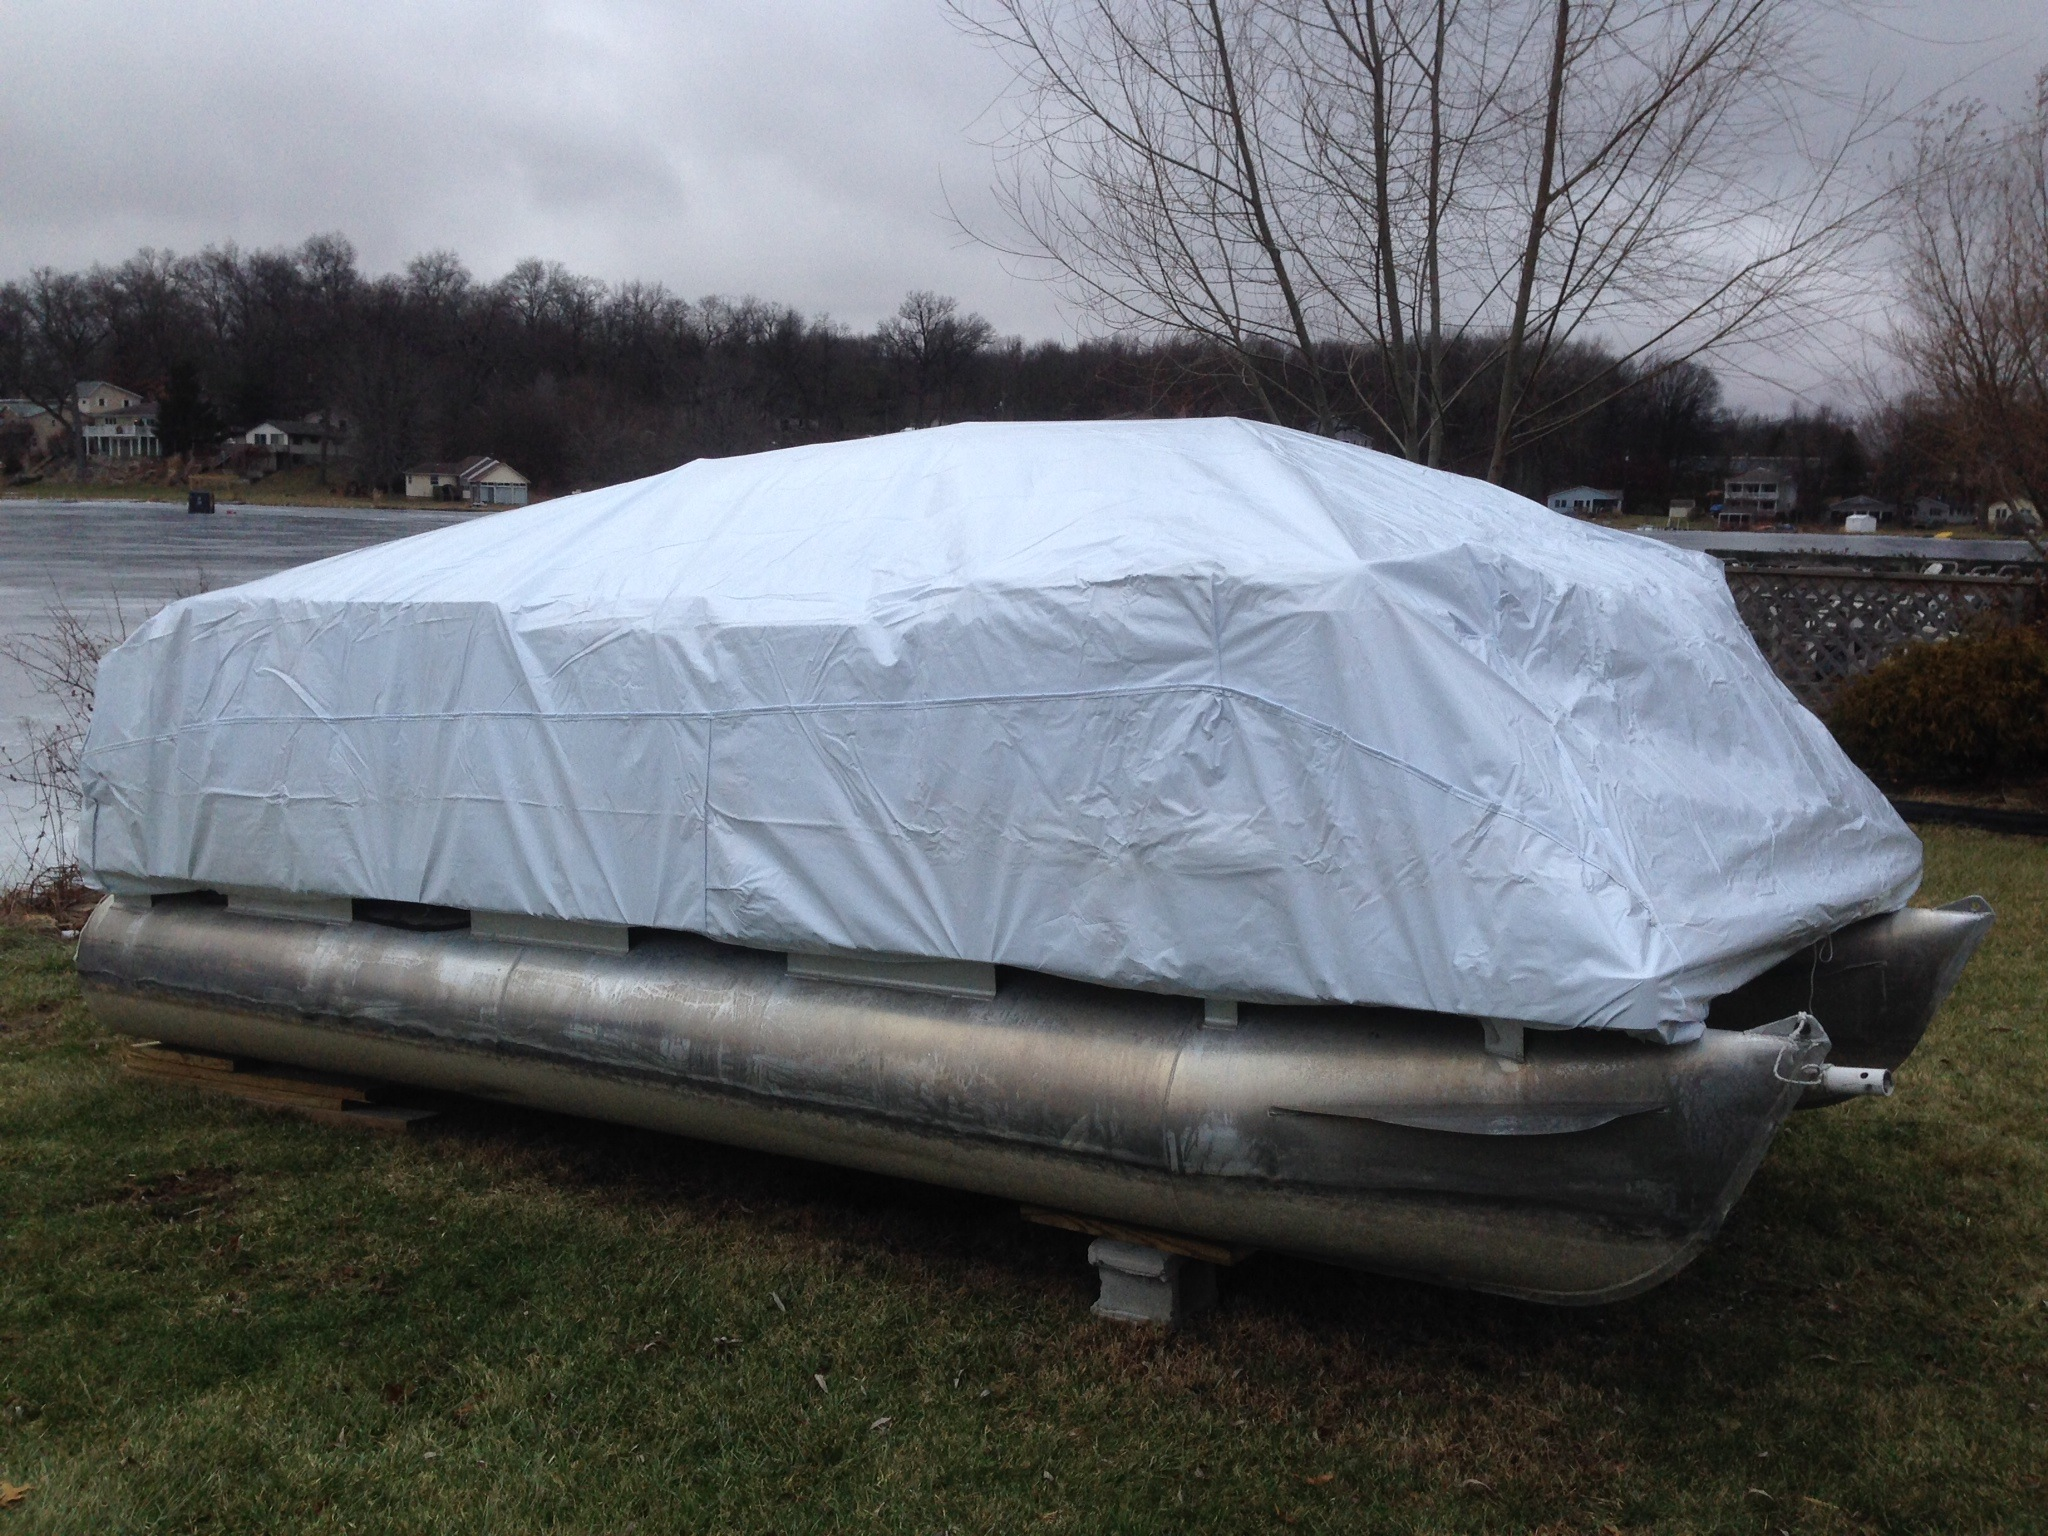 Transhield 24 ft. Pontoon Reusable Boat Cover for 4 ft ...